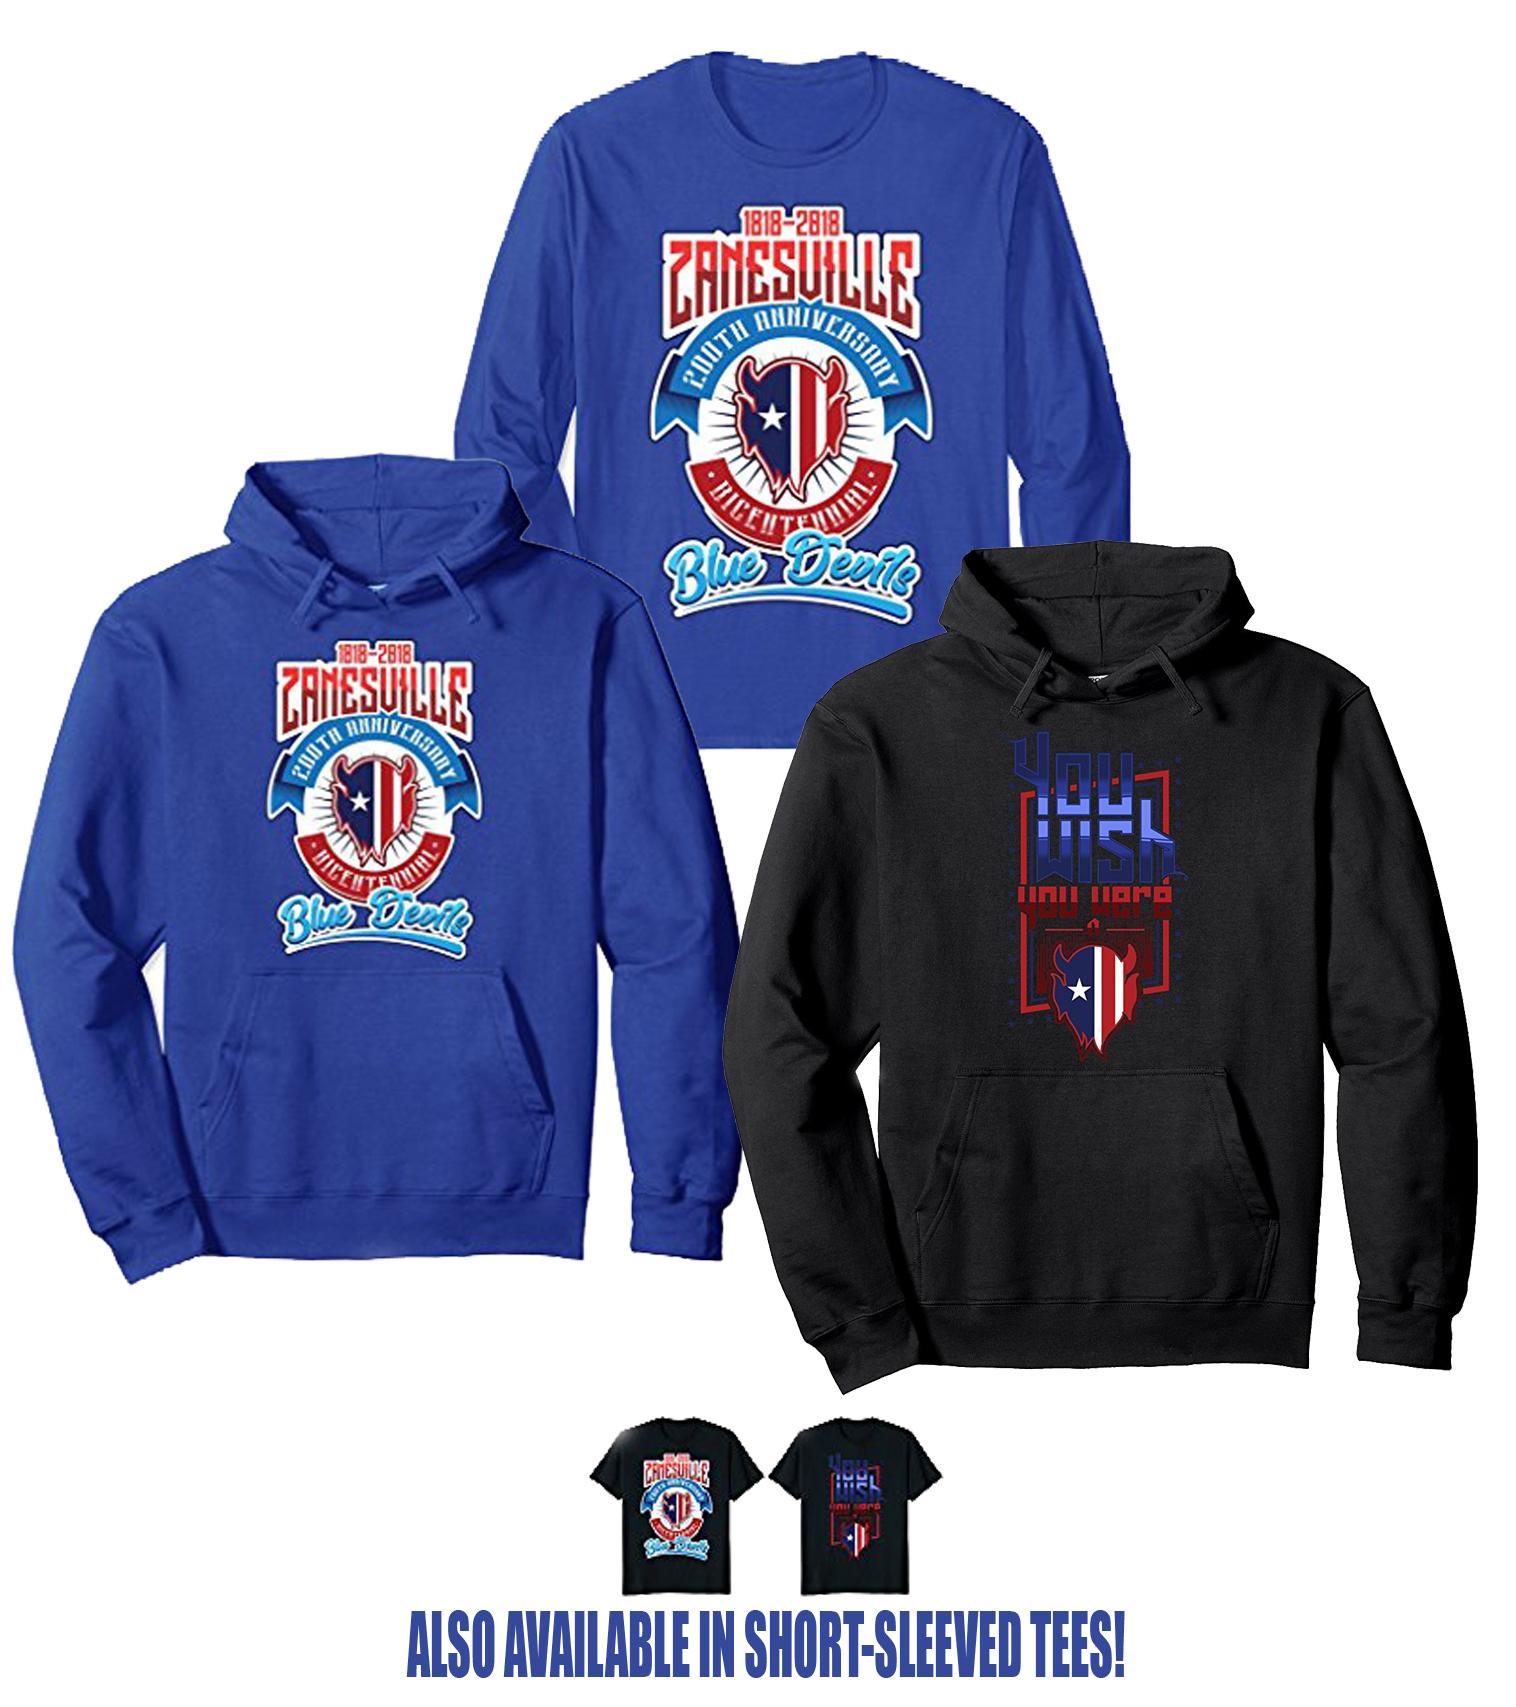 t-shirts, hoodies, bicentennial, wish you were a blue devil